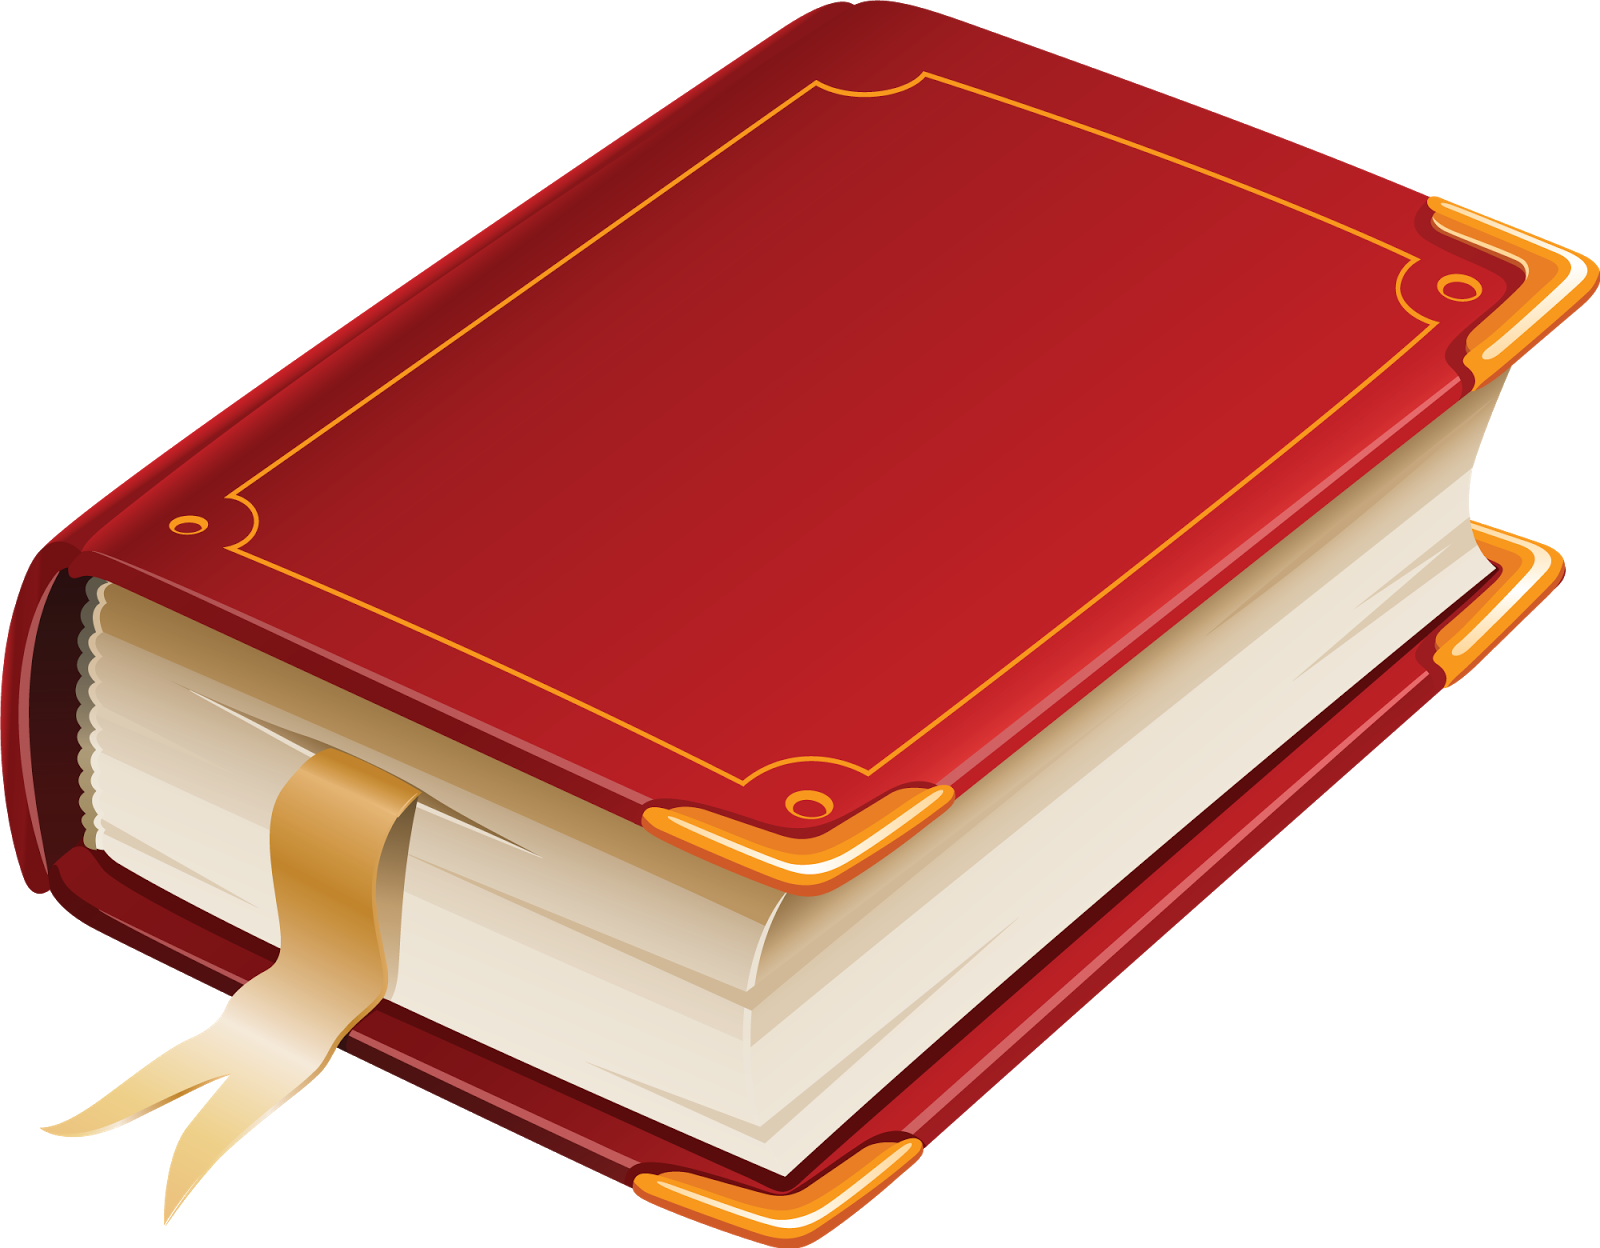 Drawing Book Cover Images : كتاب مفيد جدا للمهندسين تابع معنا عرب ألمانيا